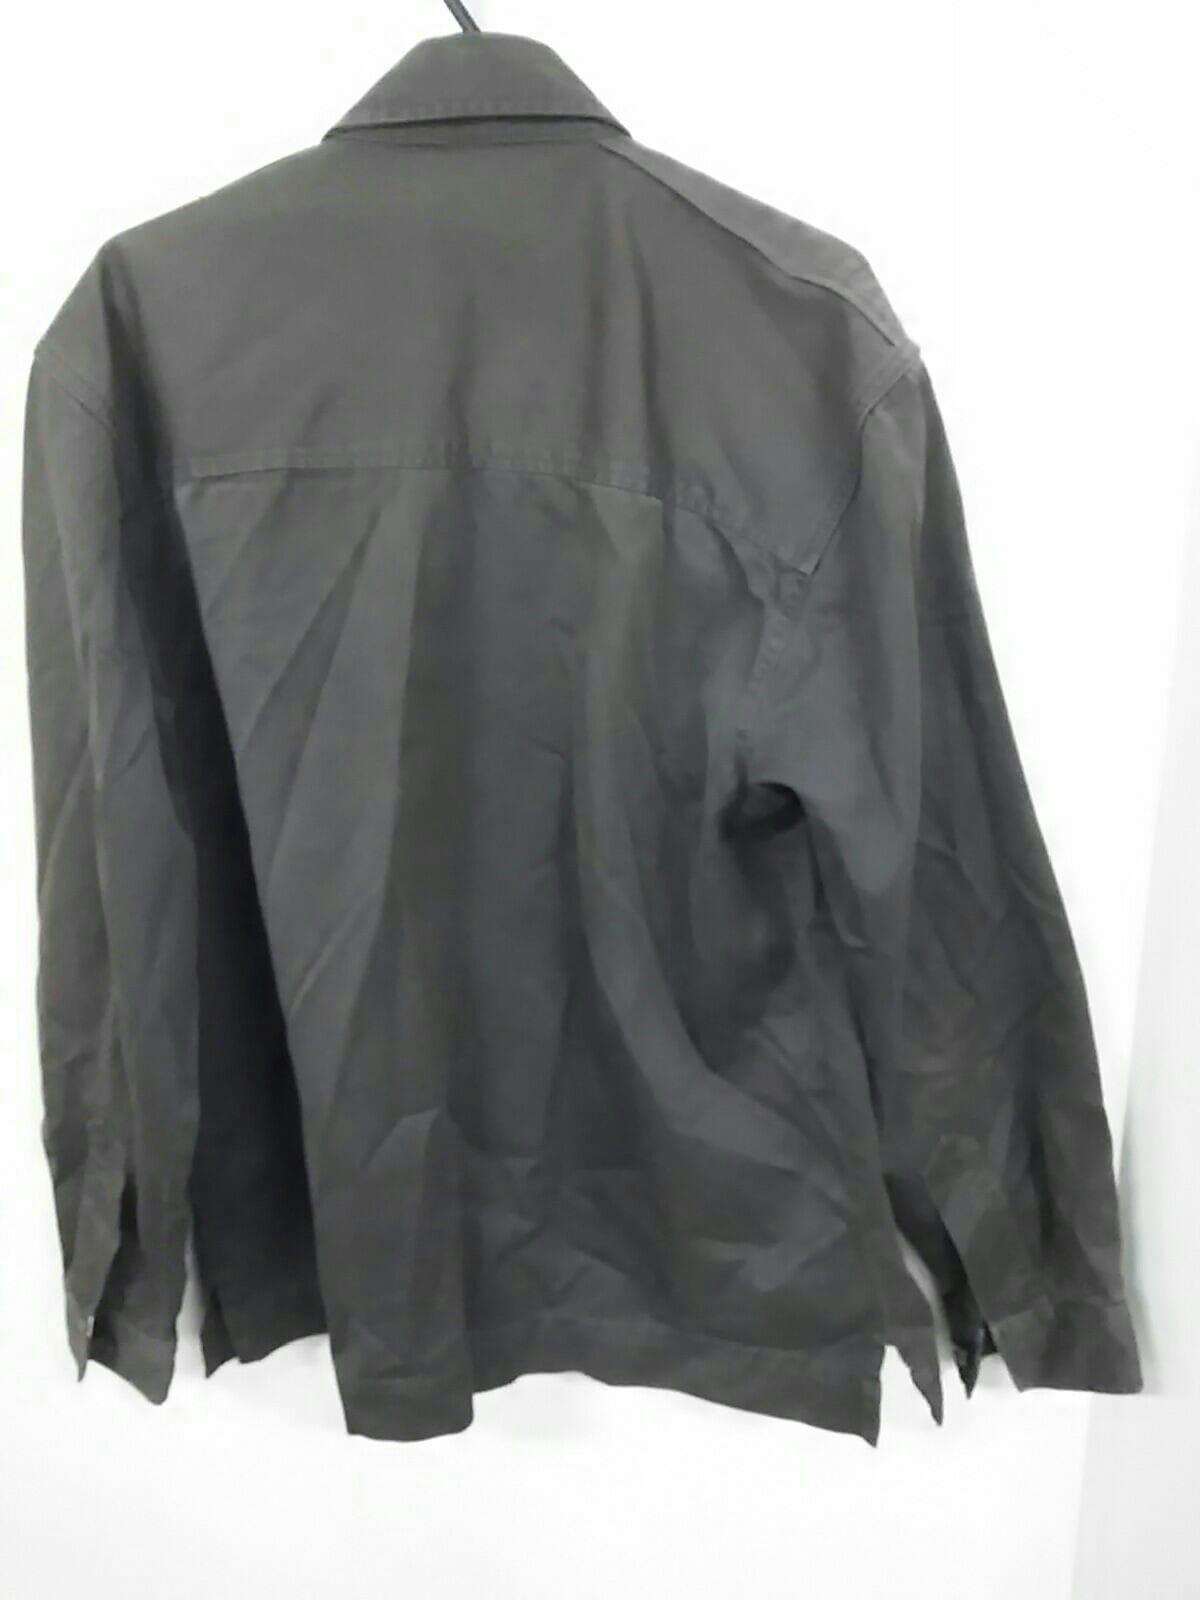 CLUB MONACO(クラブモナコ)のジャケット